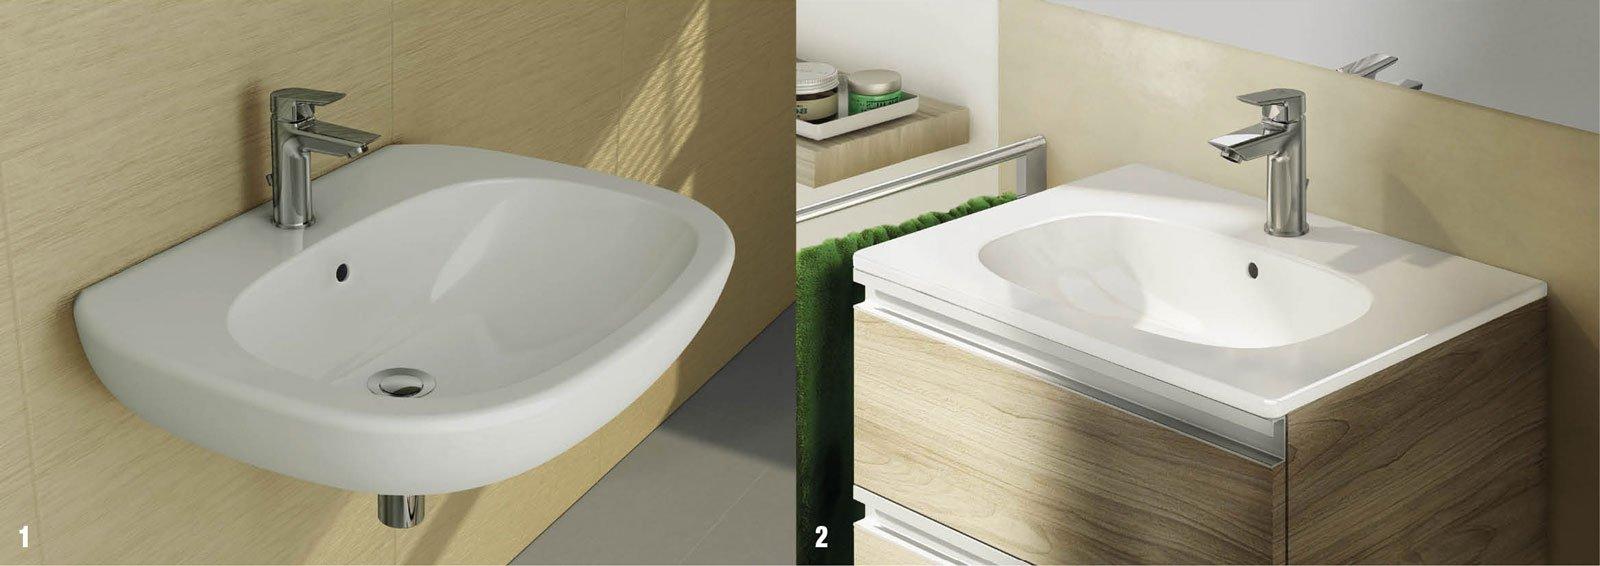 Tesi e ceramix per un bagno di tendenza cose di casa - Mobili bagno ideal standard ...